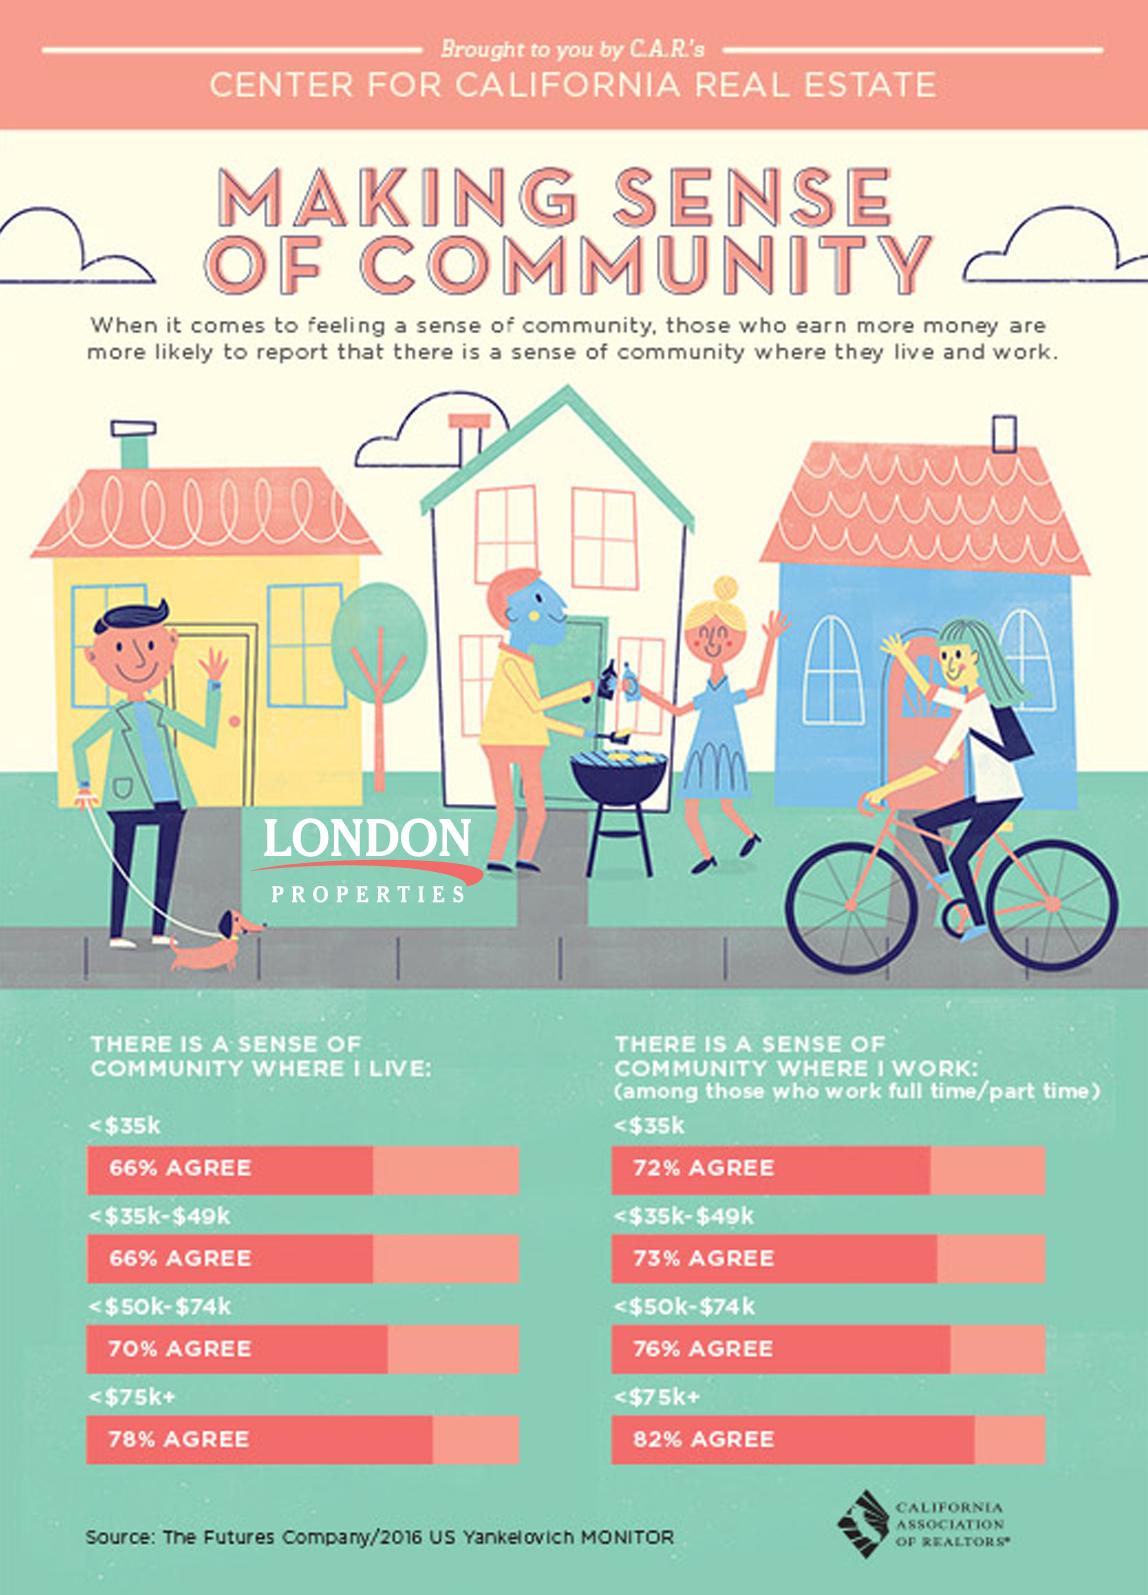 Making Sense of Community